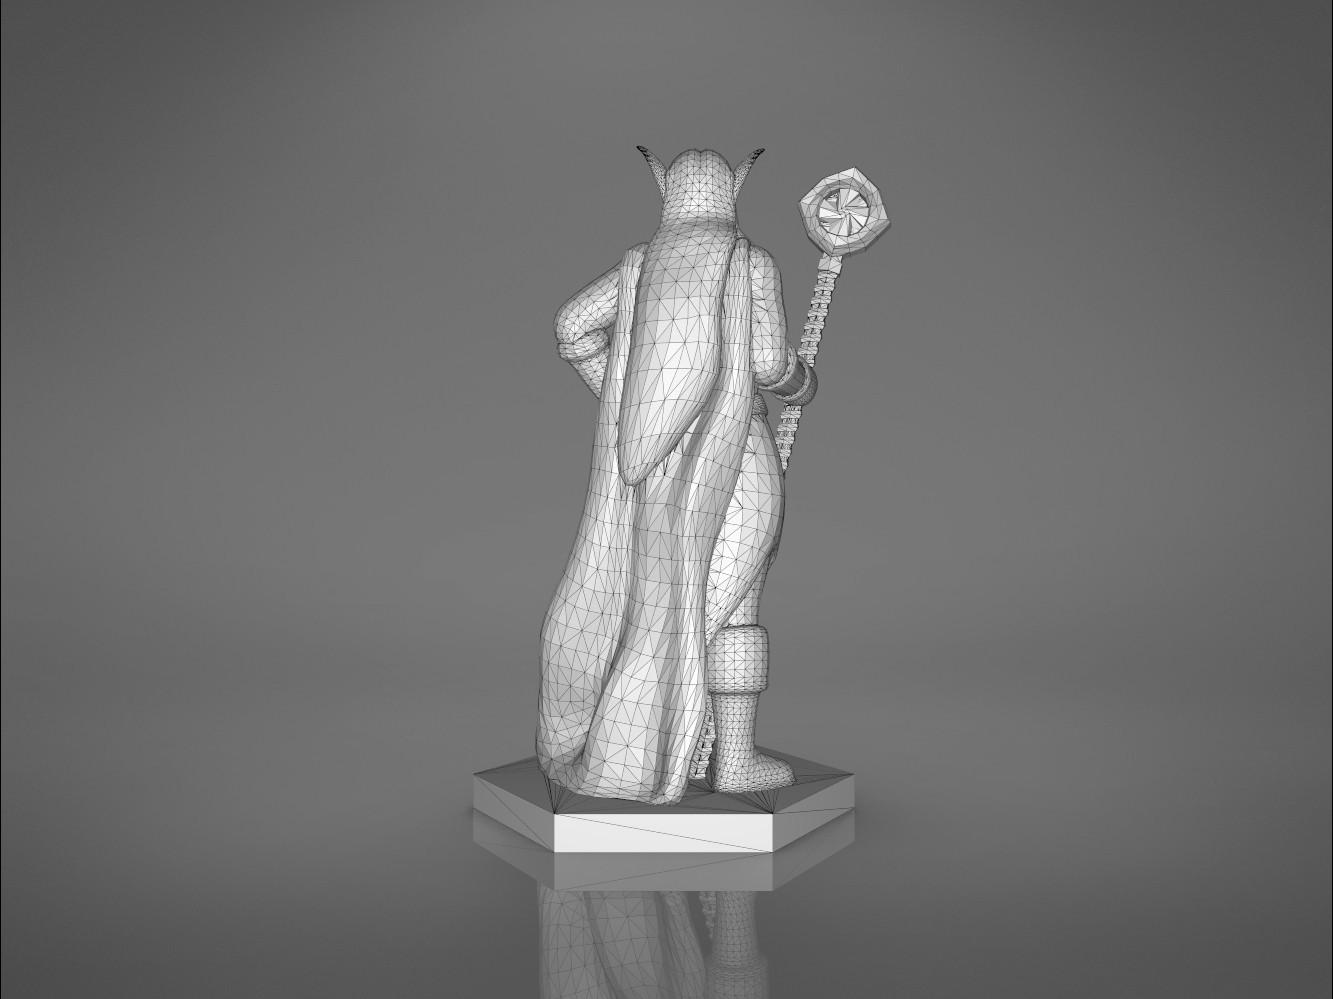 Mage_2_-back_perspectivve.175.jpg Download STL file ELF MAGE FEMALE CHARACTER GAME FIGURES 3D print model • 3D printing template, 3D-mon